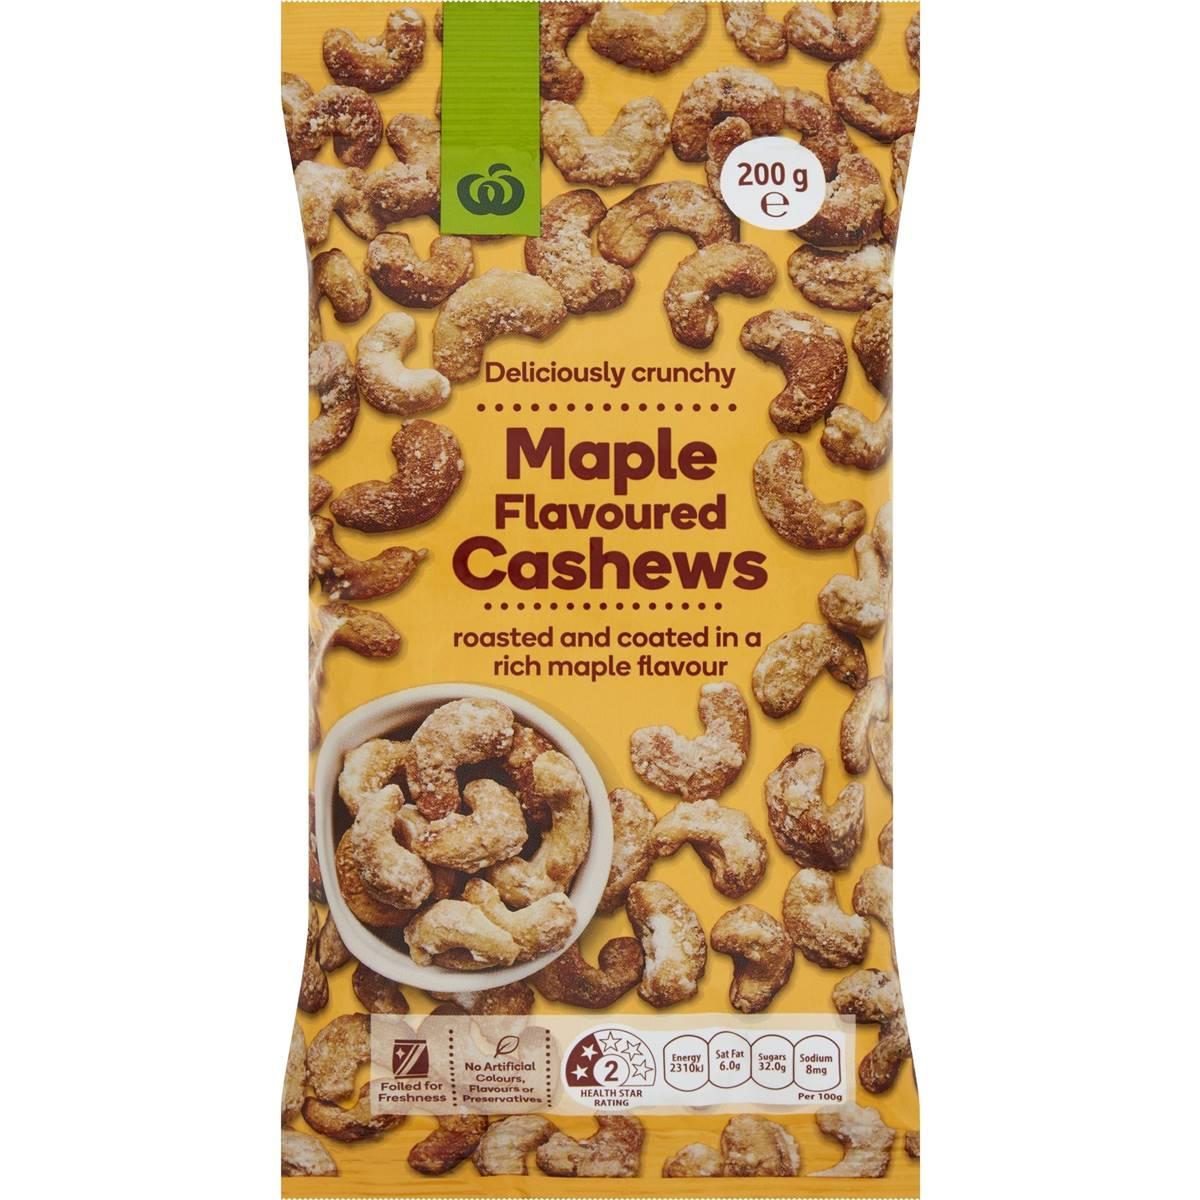 Woolworths Cashews Maple Flavoured